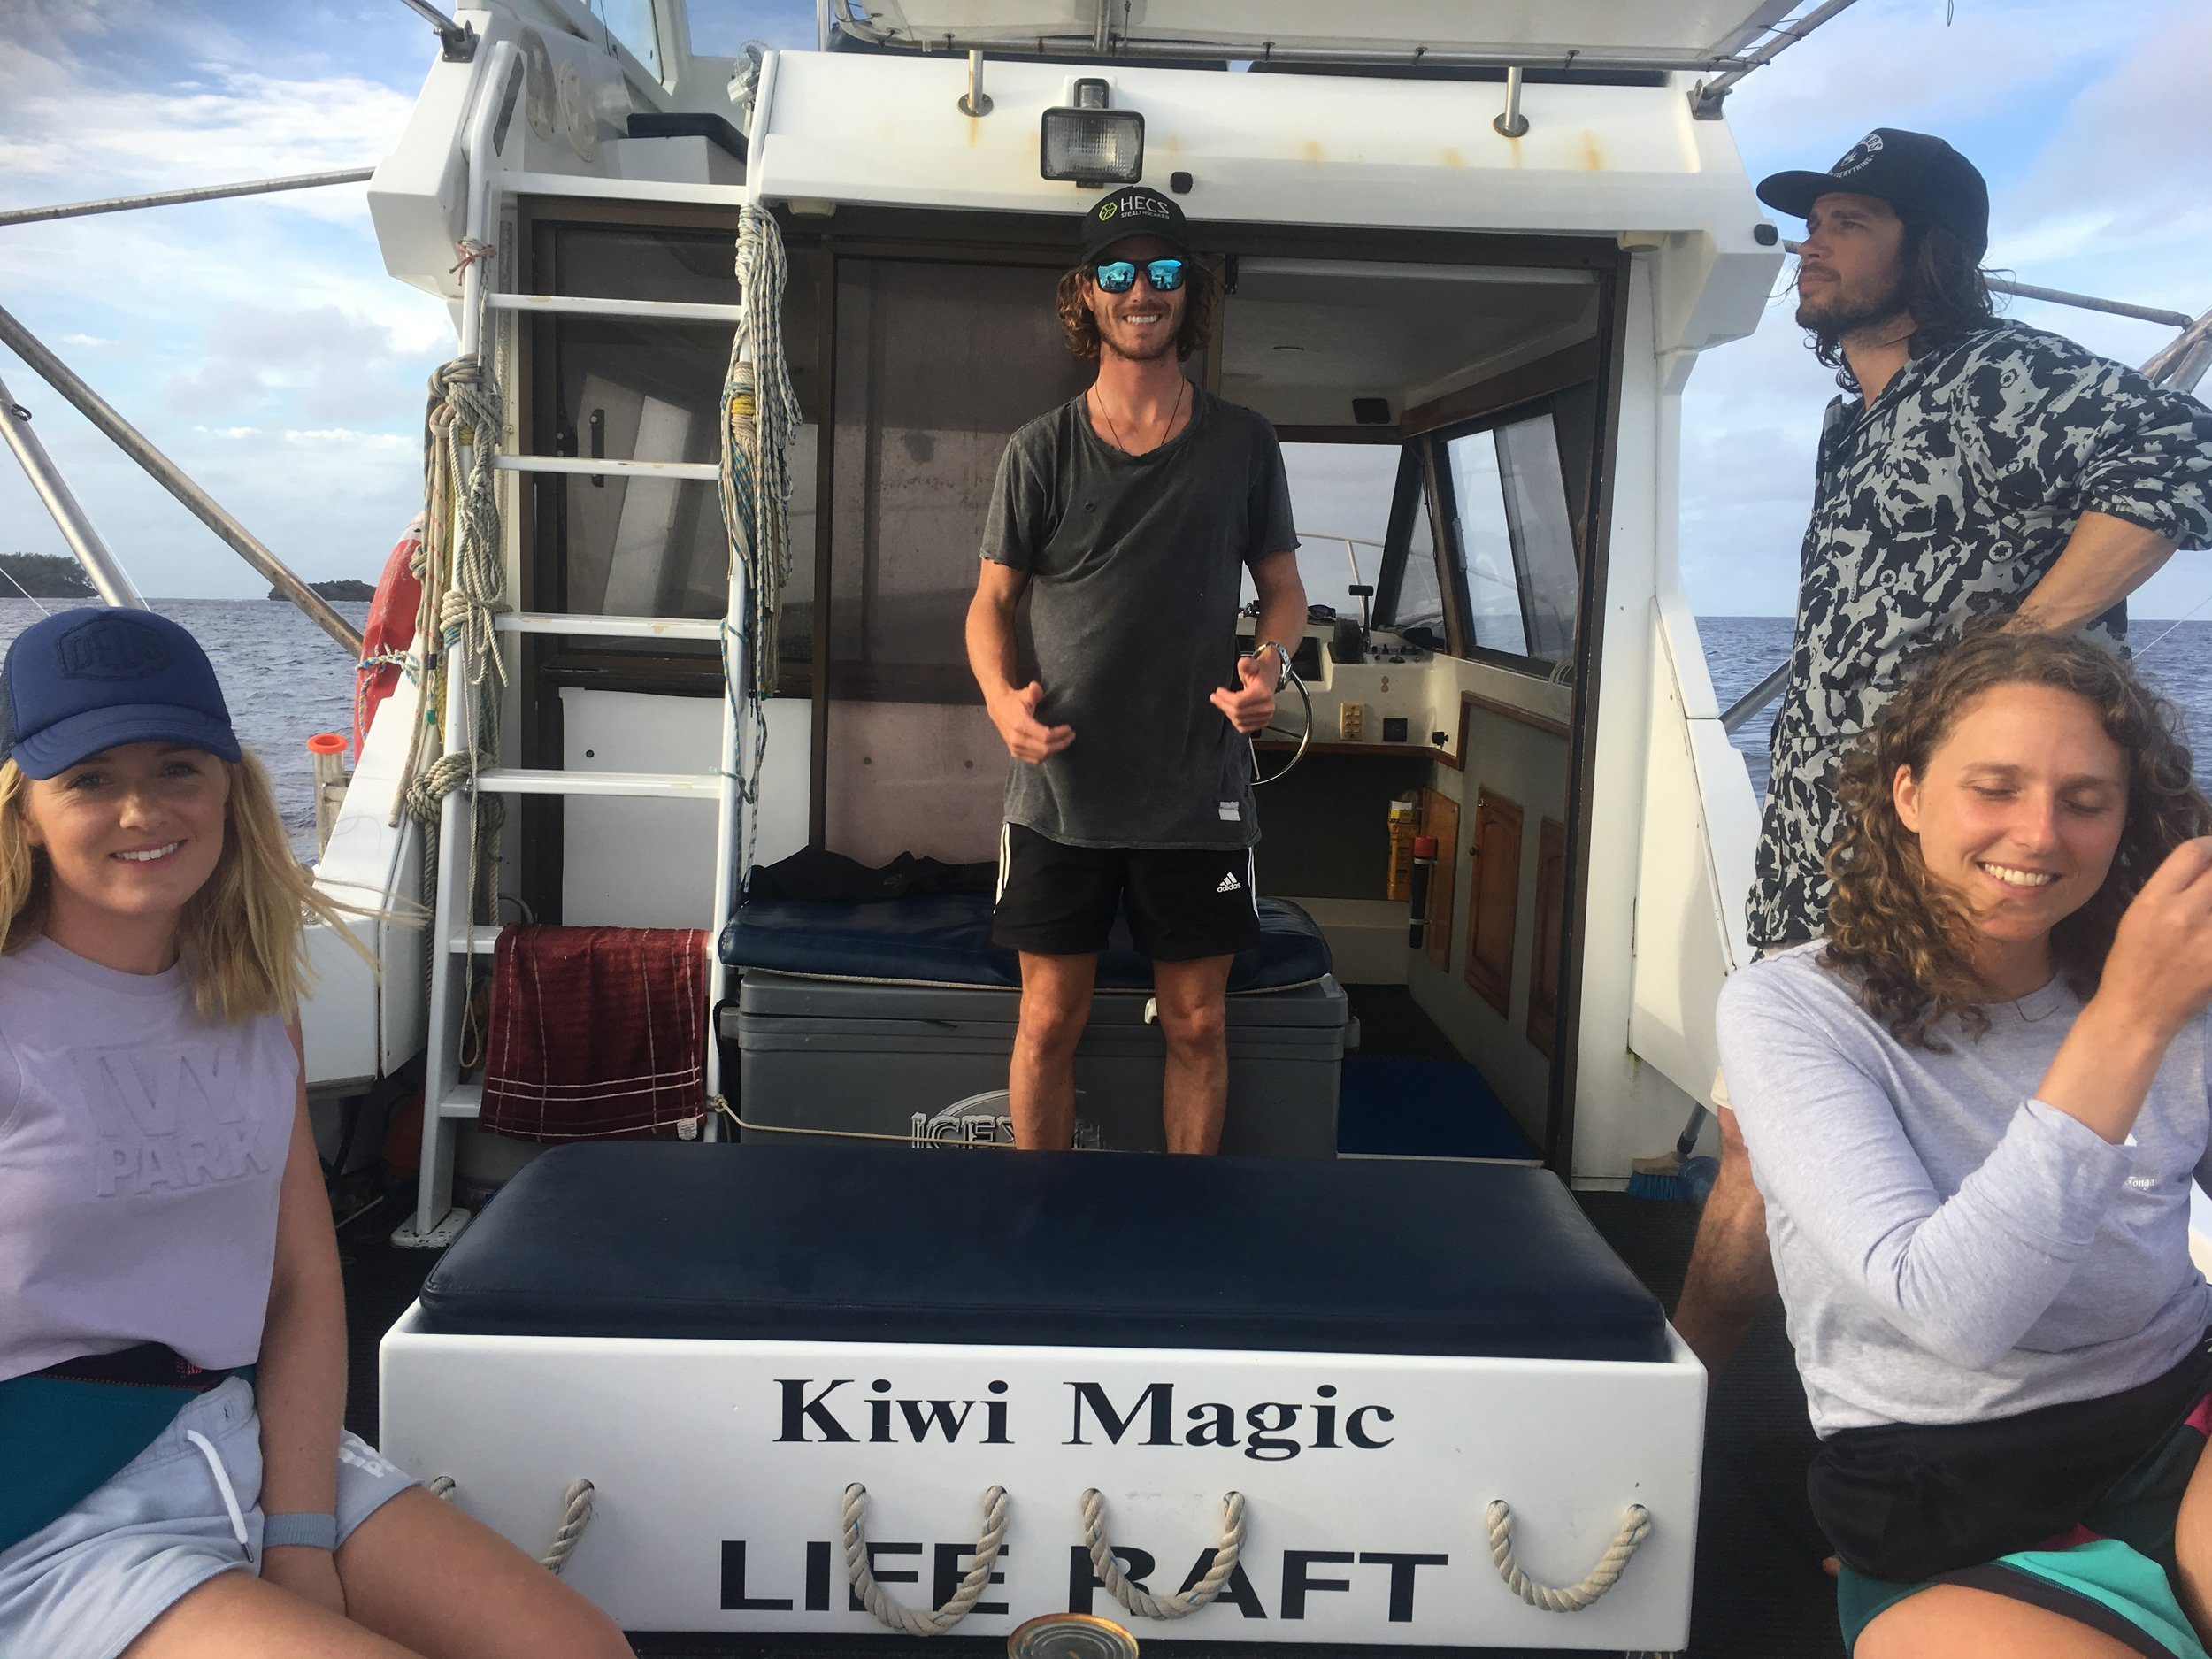 2017-oct-14-kate-matt-tom-anne-on-kiwi-magic.jpg